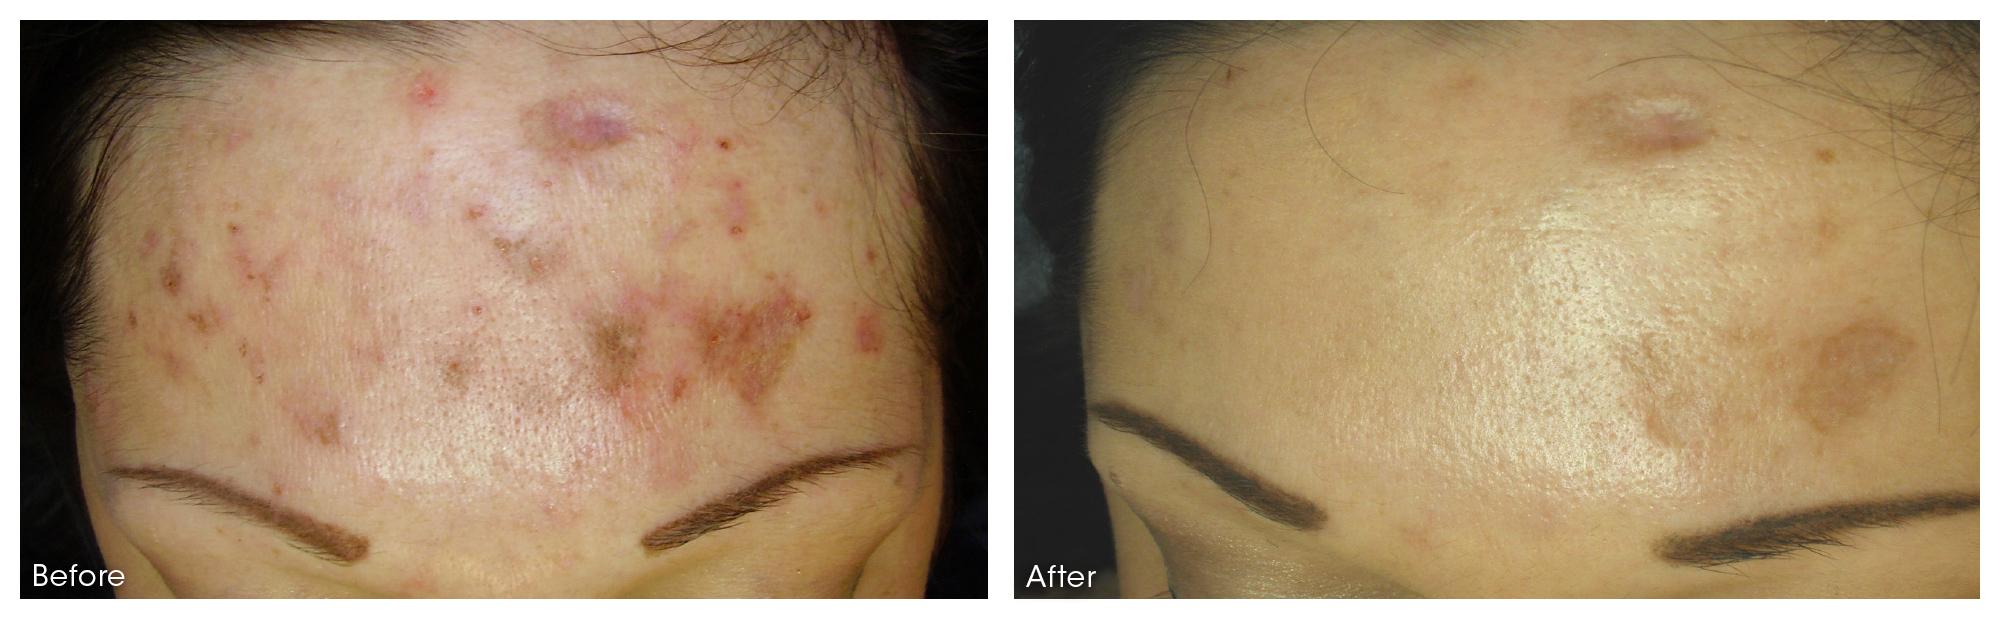 dermaroller-scar-5-PRINT